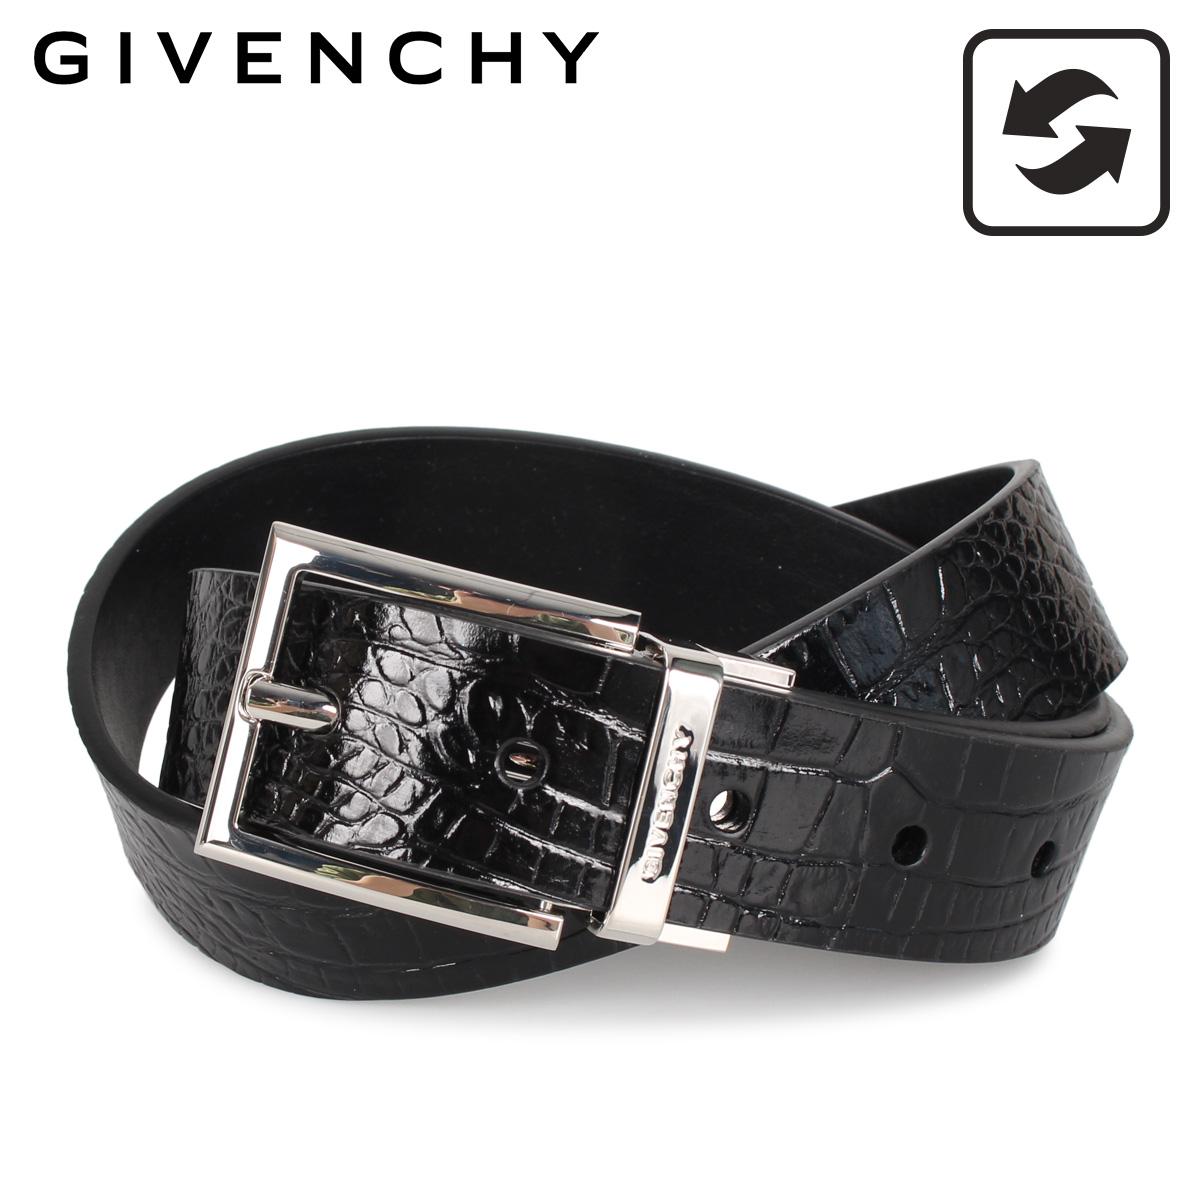 GIVENCHY ジバンシィ ベルト レザーベルト メンズ 本革 レザー リバーシブル ブラック 黒 BK401K [3/9 新入荷]